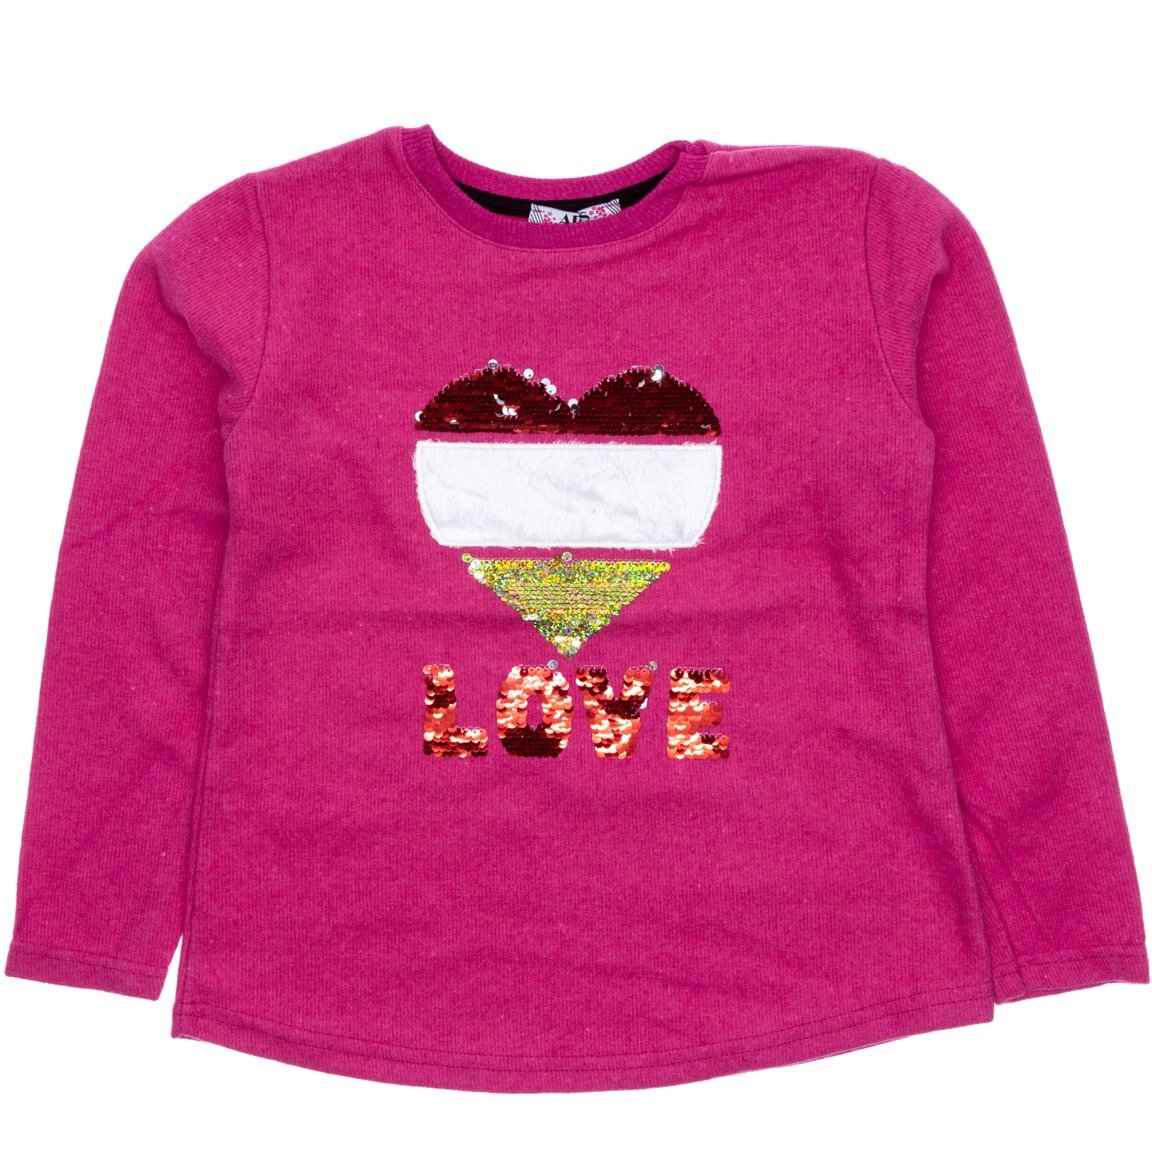 ARS παιδική μπλούζα «Fur Love»